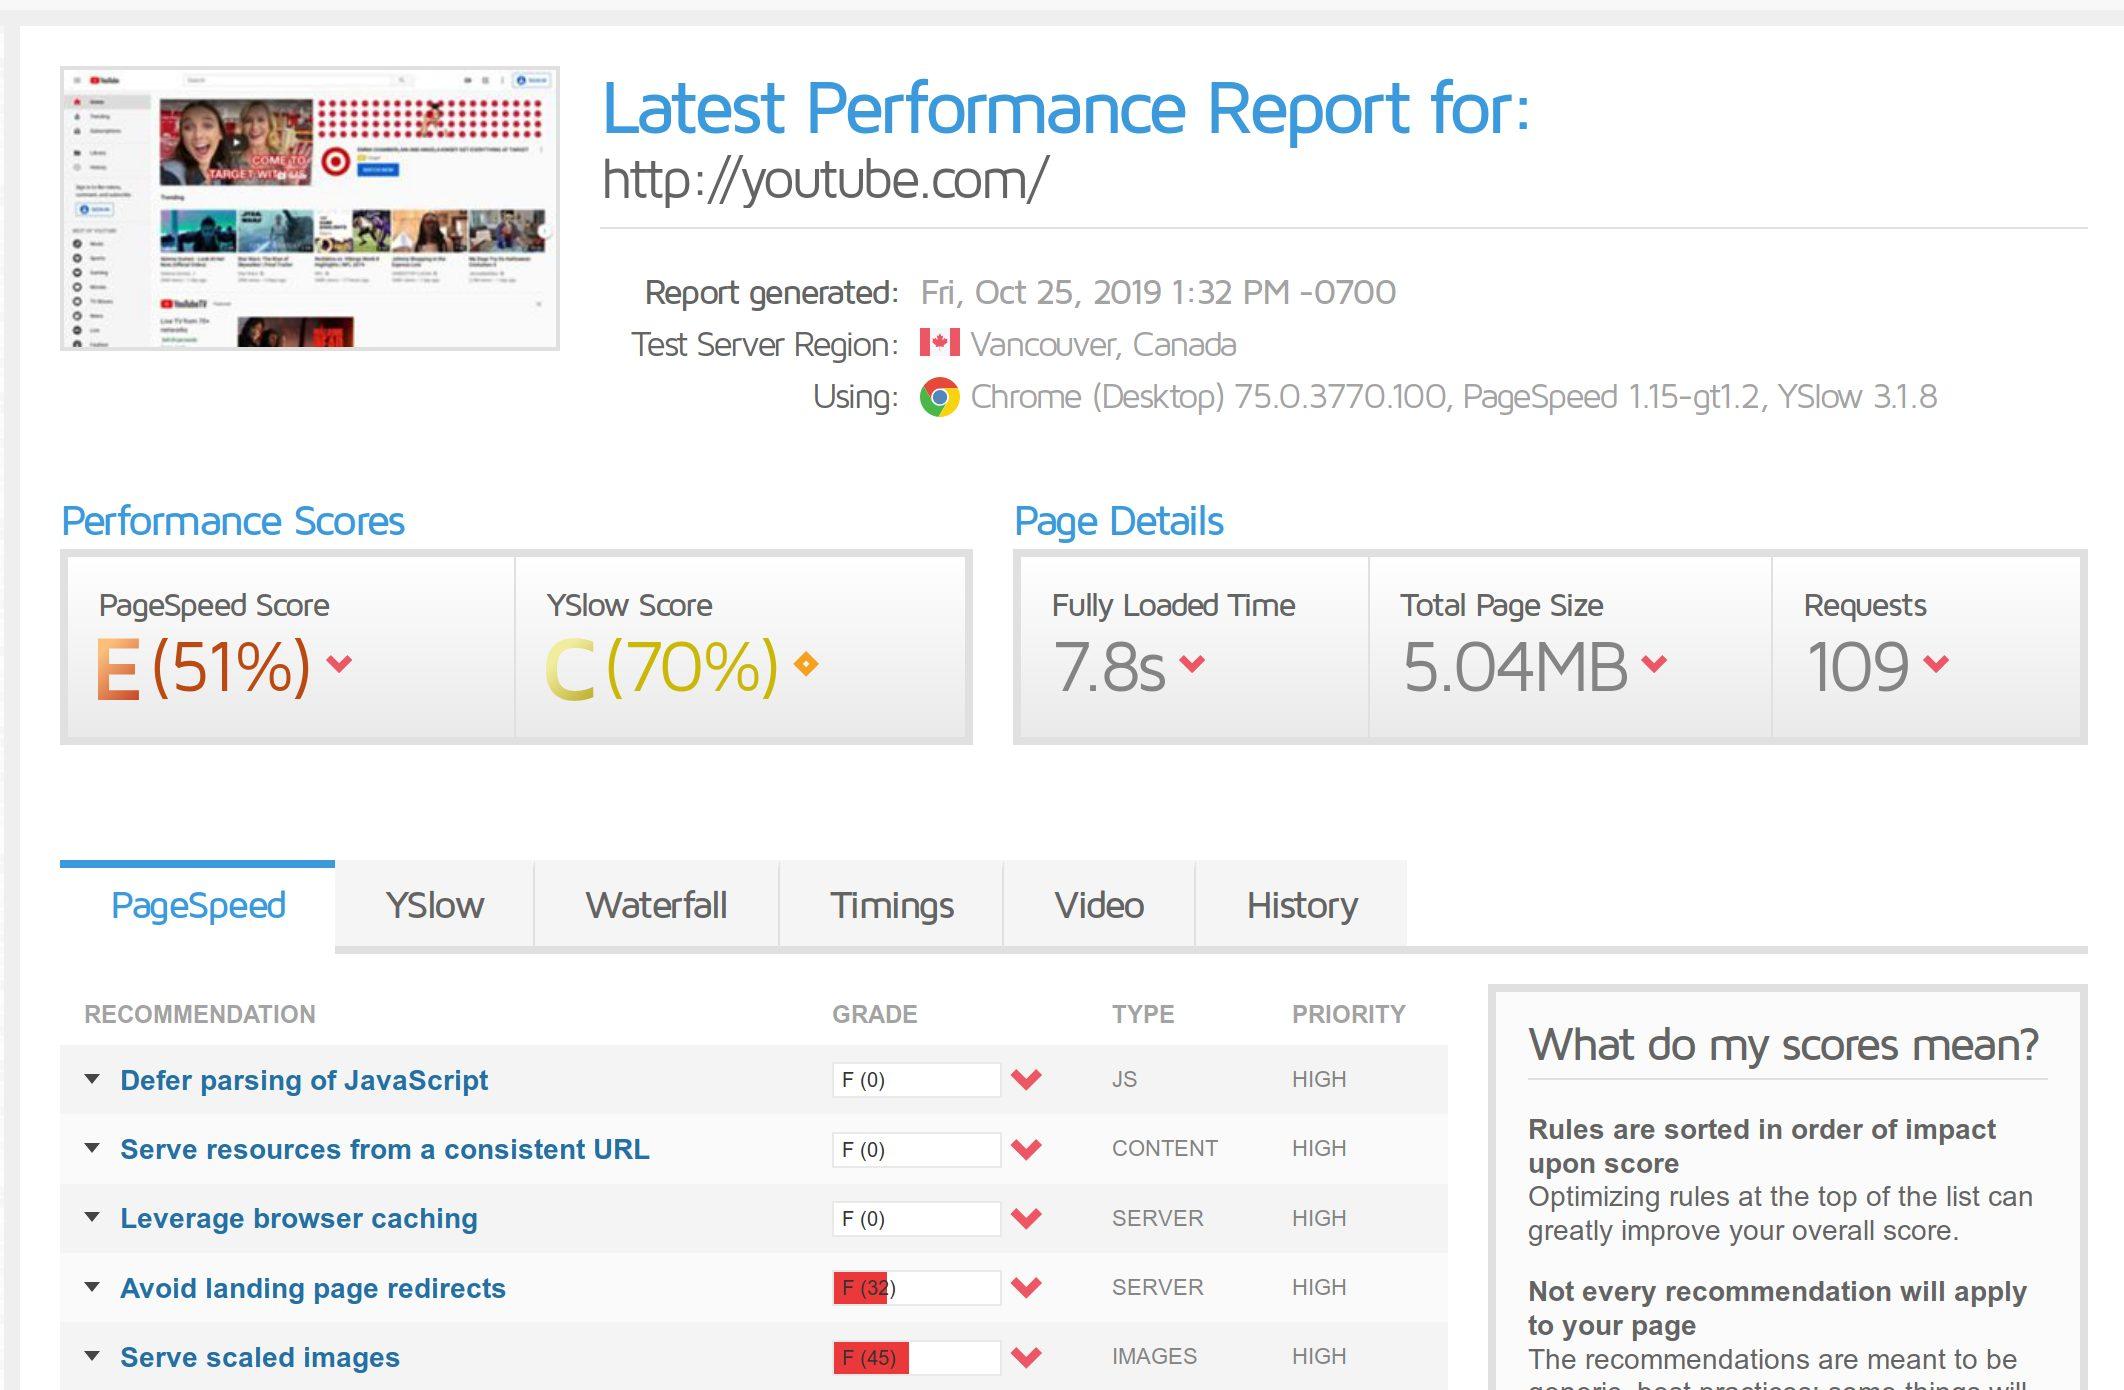 A screenshot of the free SEO tool GTMetrix showing a performance report for YouTube